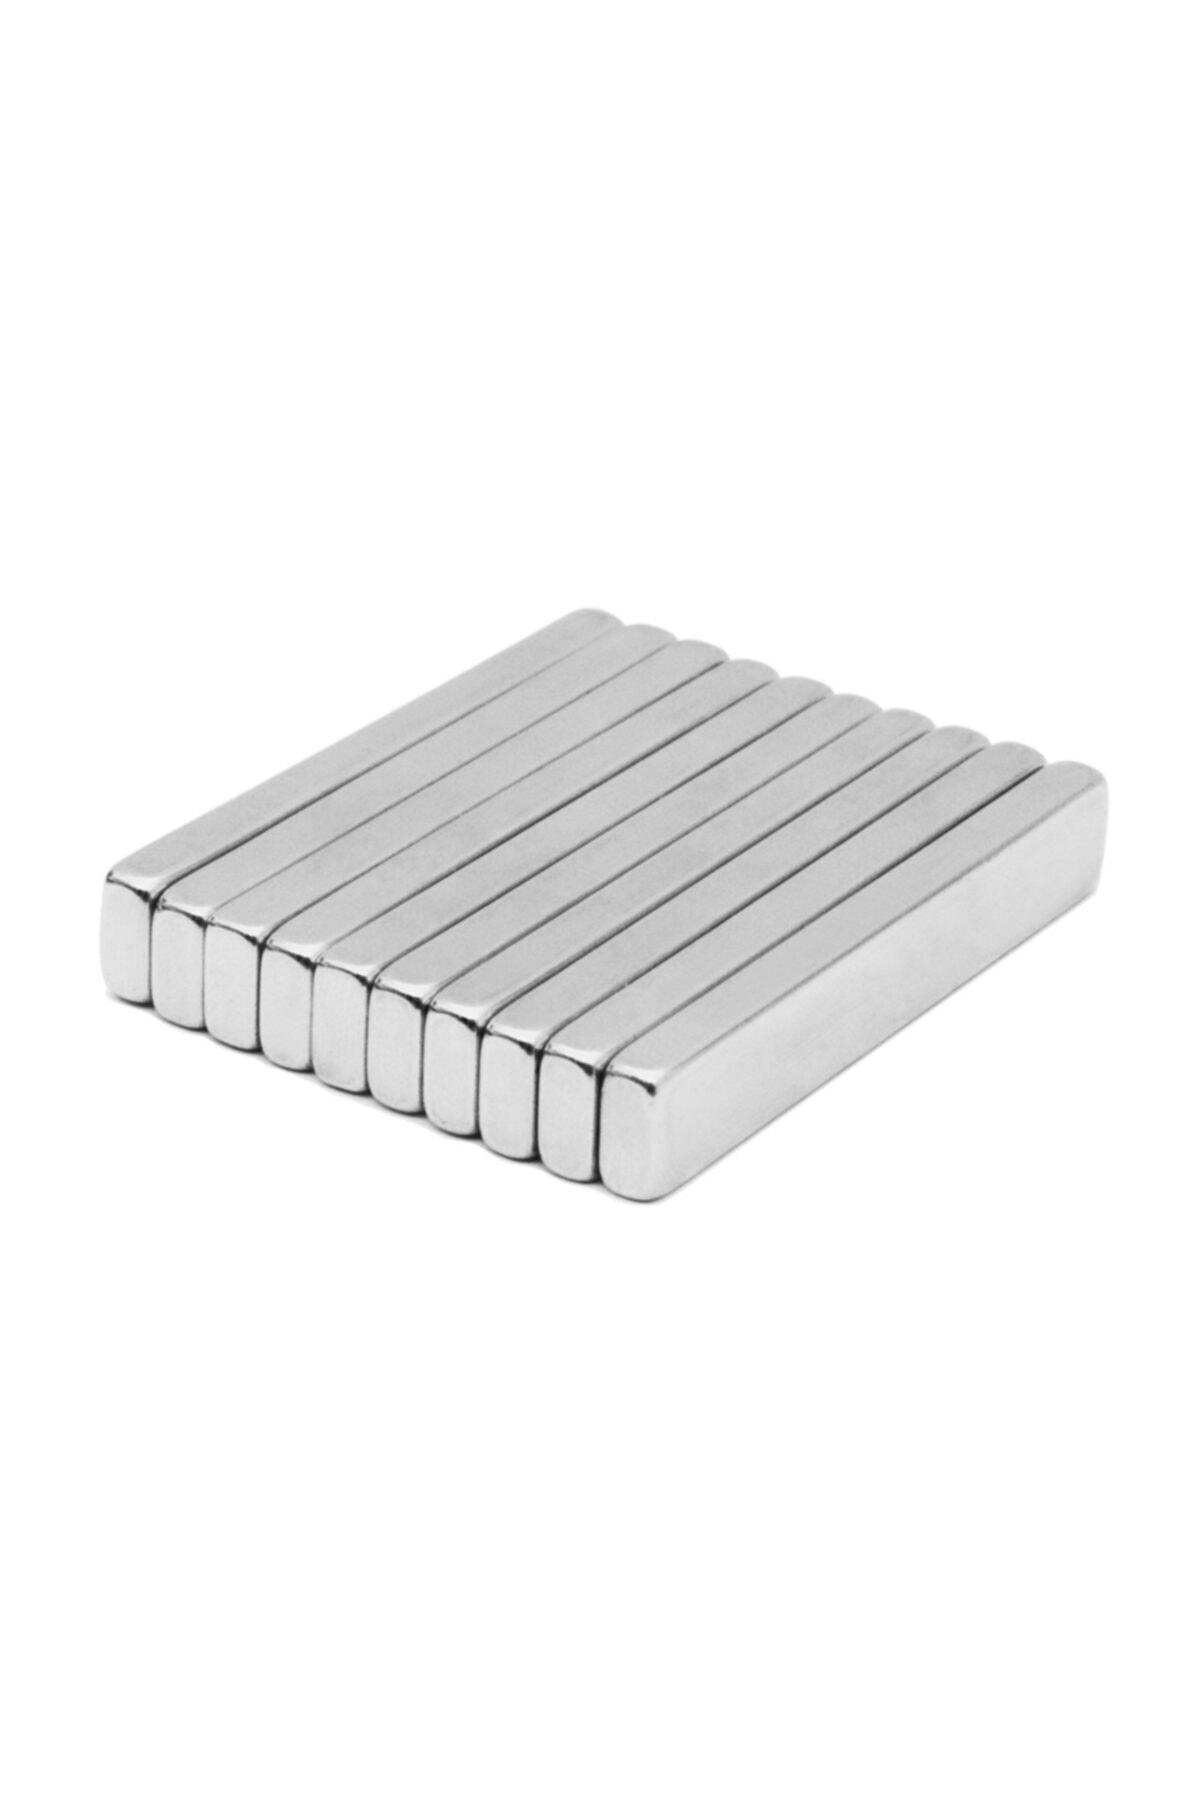 Dünya Magnet 5 Adet Çok Güçlü 50mm X 10mm X 5mm Köşeli Süper Güçlü Neodyum Mıknatıs 2